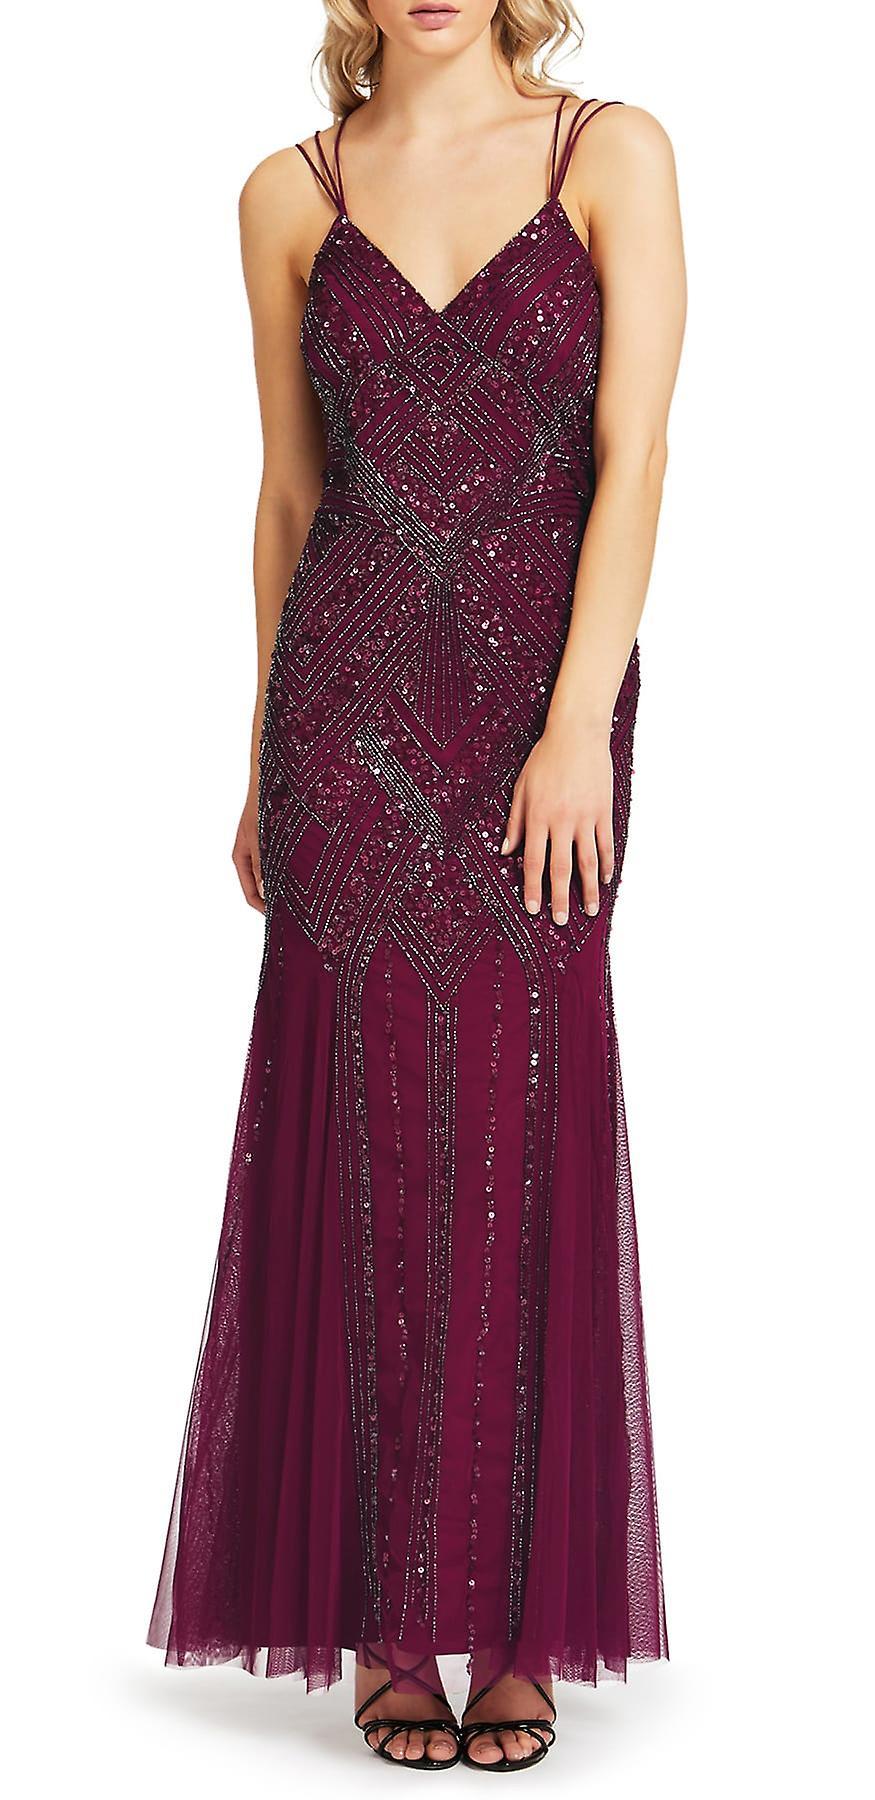 Ariella Beaded Chiffon 1920s Art Deco Strappy Evening Gown Maxi Prom ...